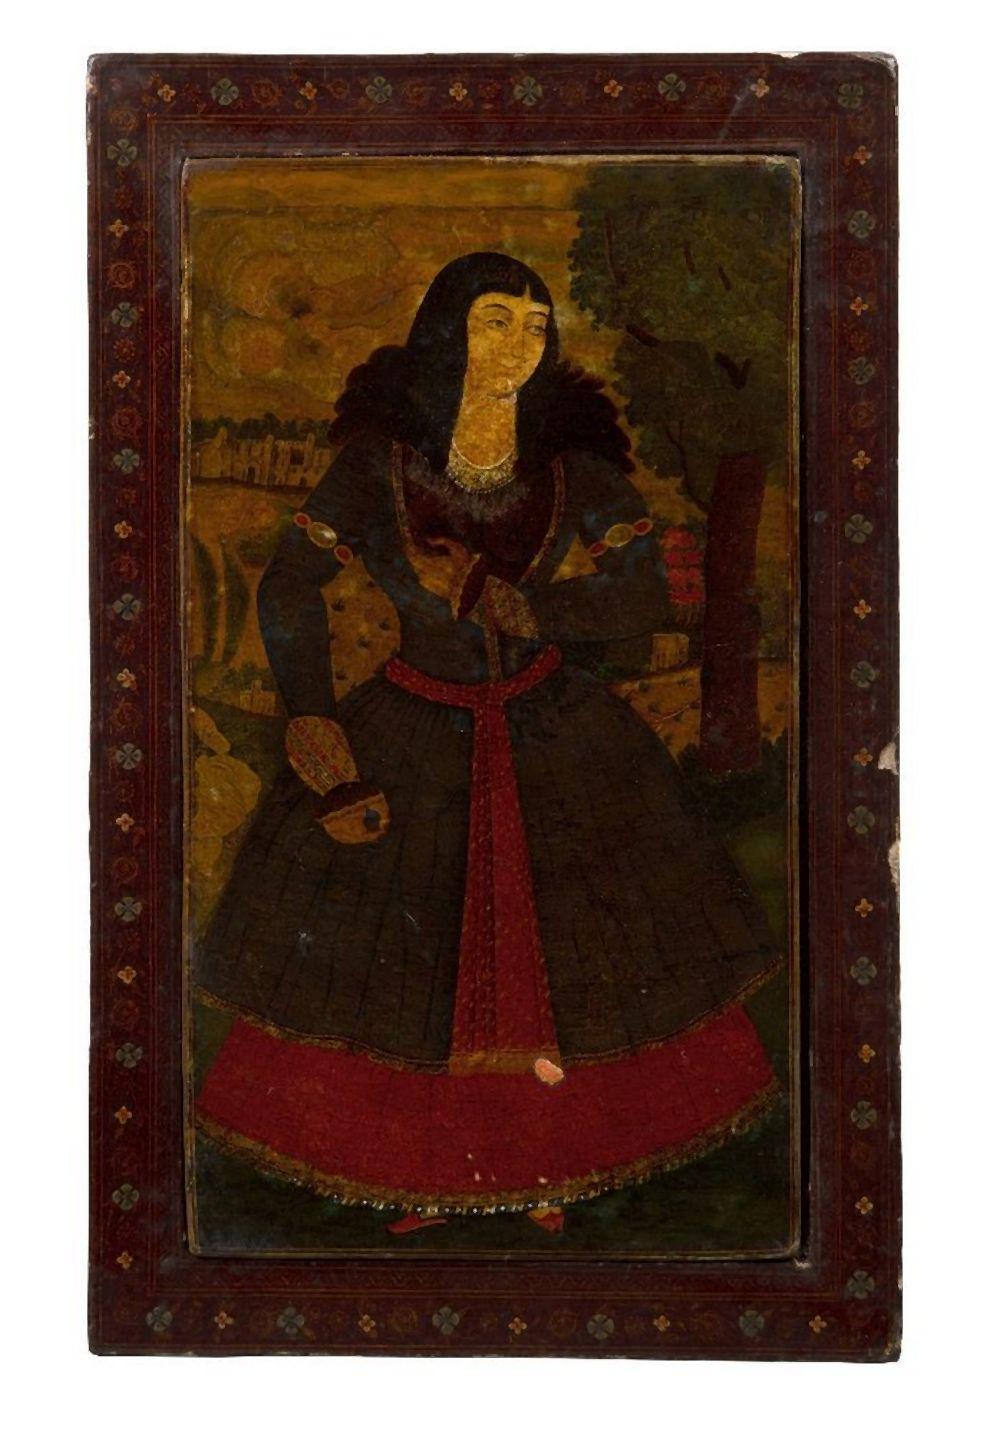 A Qajar polychrome lacquered papier mache mirror case, signed, Iran, second